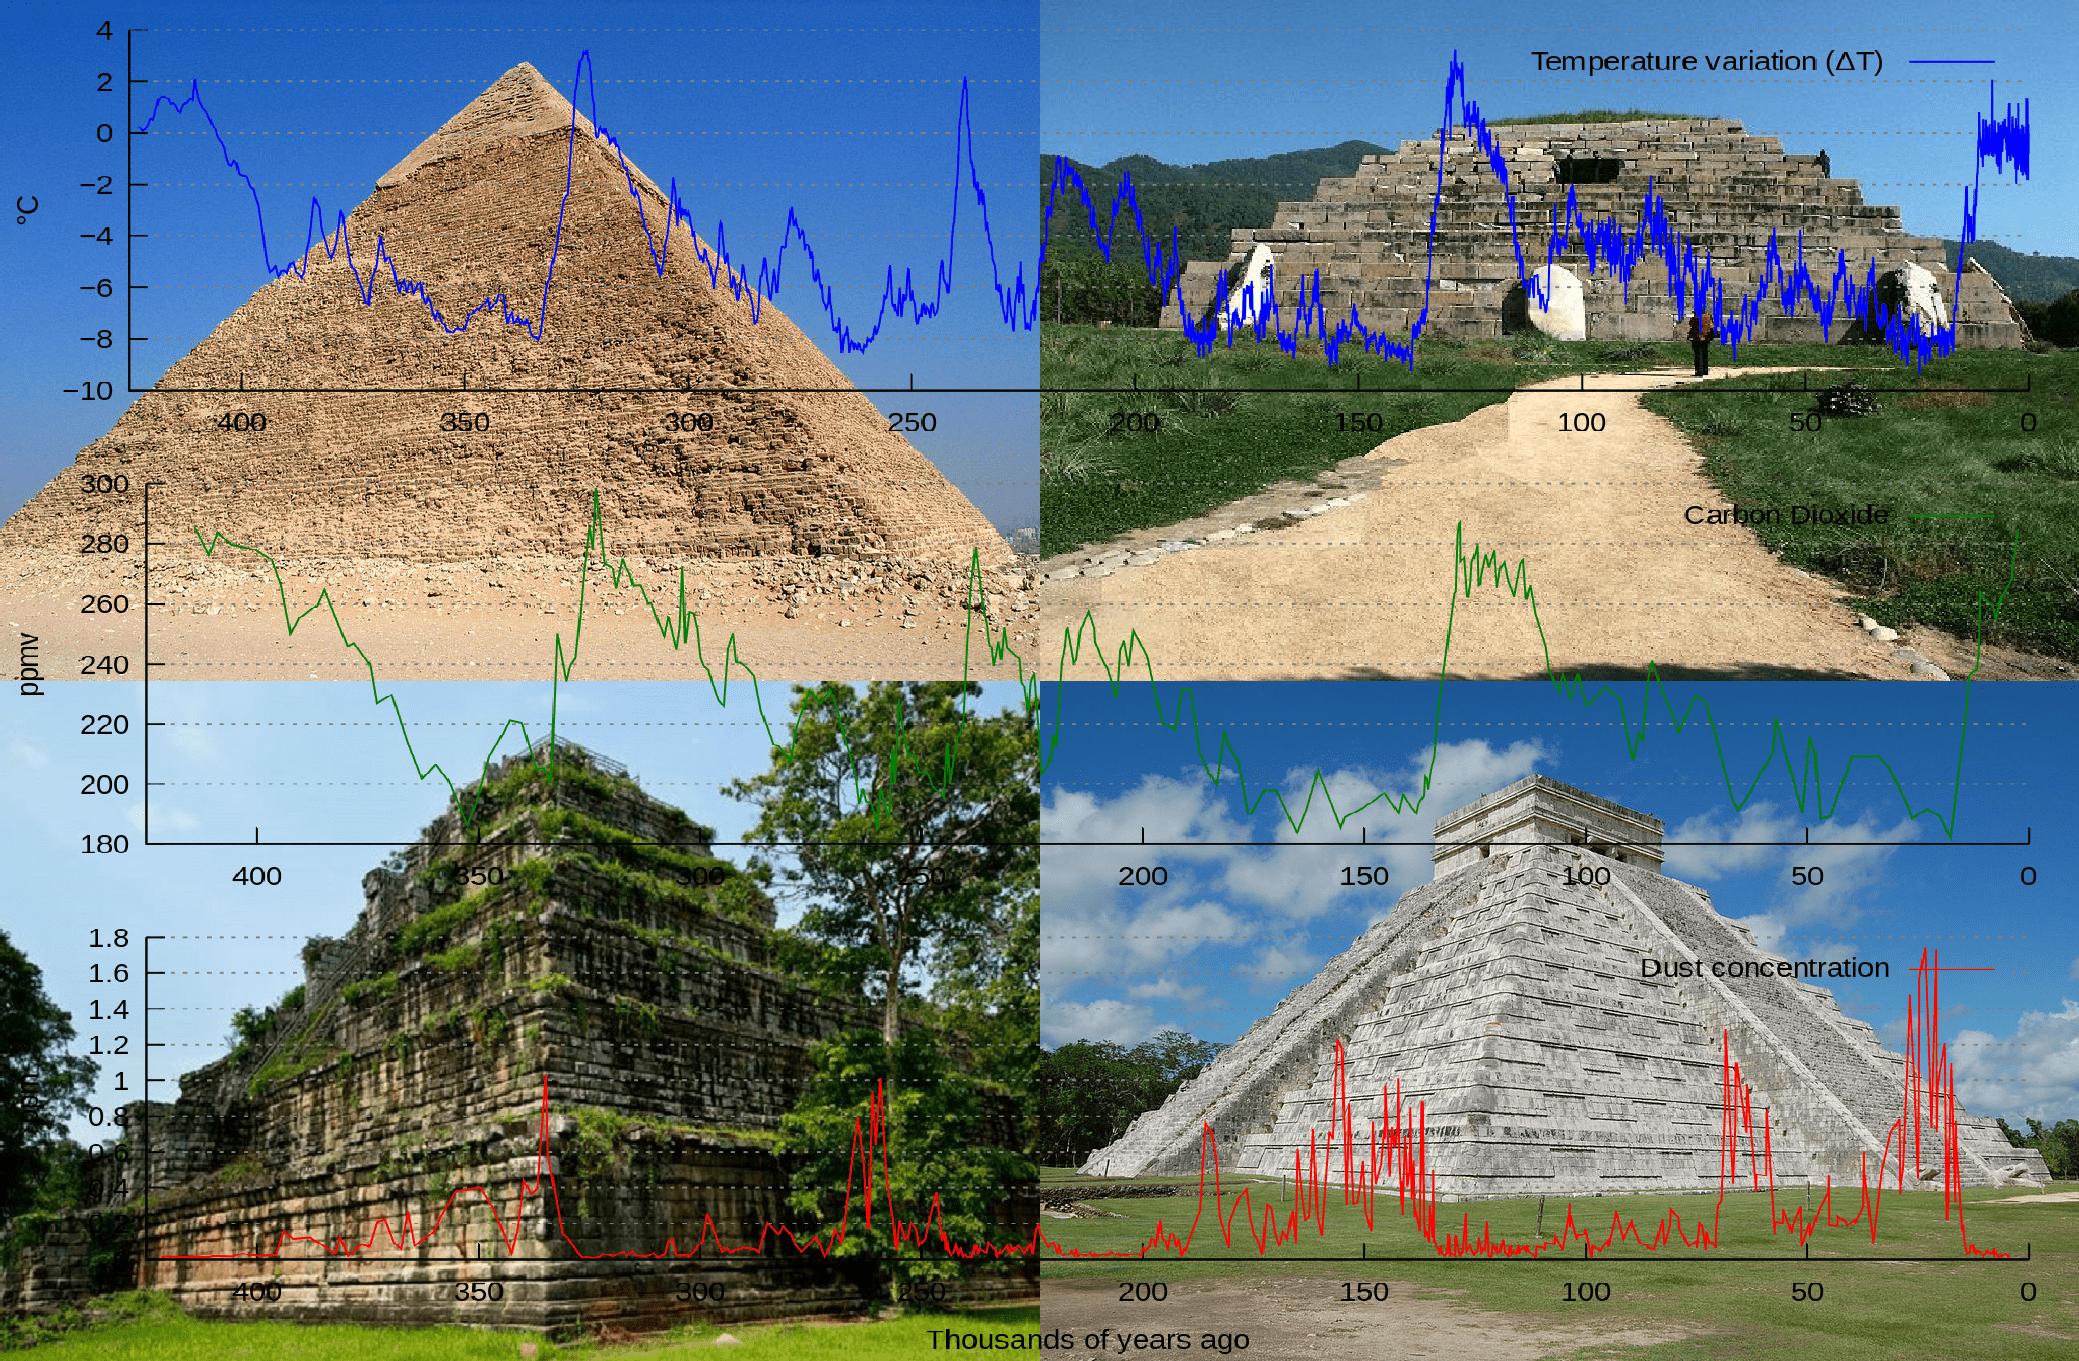 pyramid-collage3-min-2096838-6255302